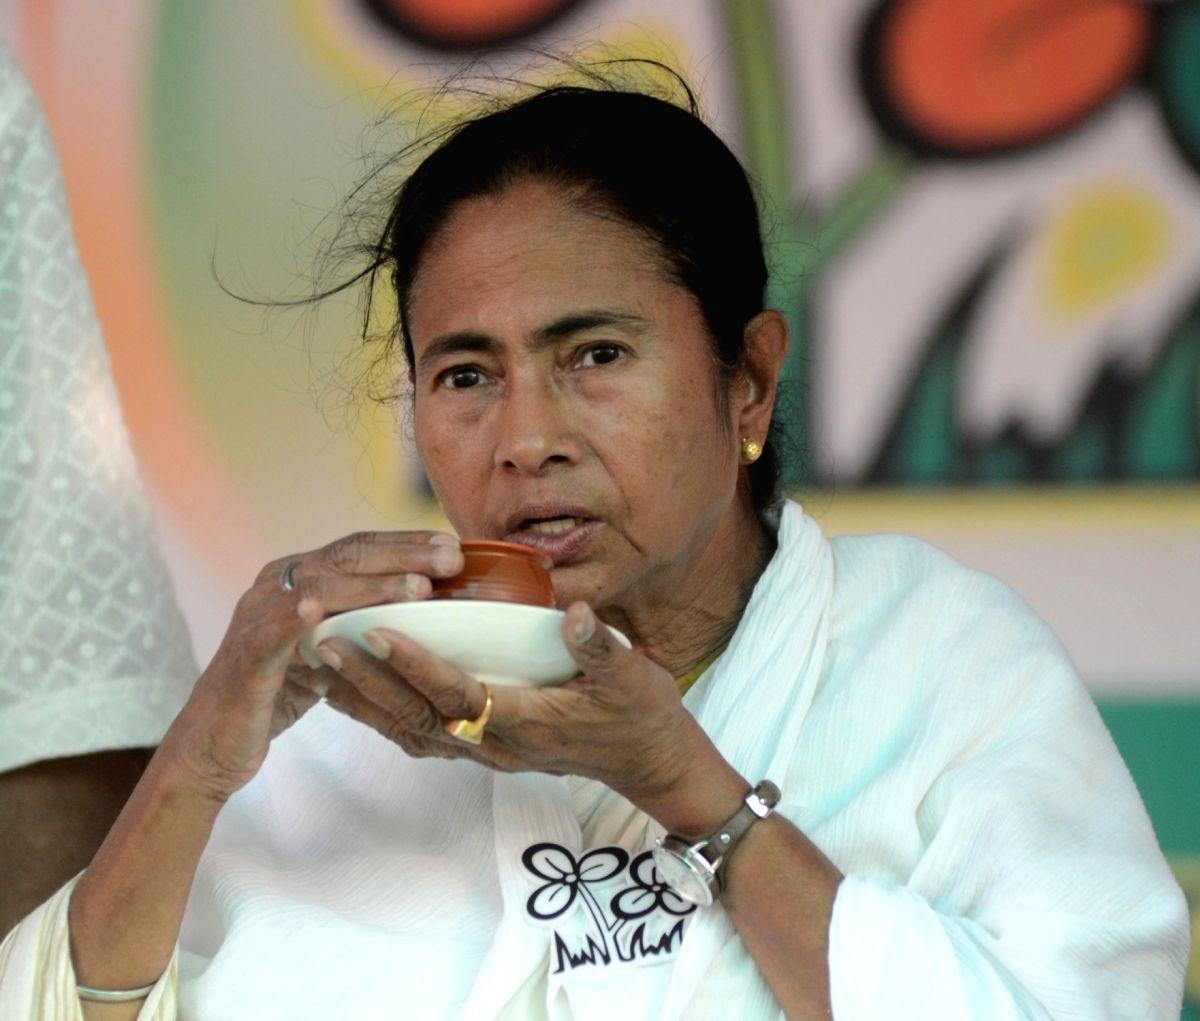 West Bengal Chief Minister and Trinamool Congress supremo Mamata Banerjee. (Image Source: IANS)